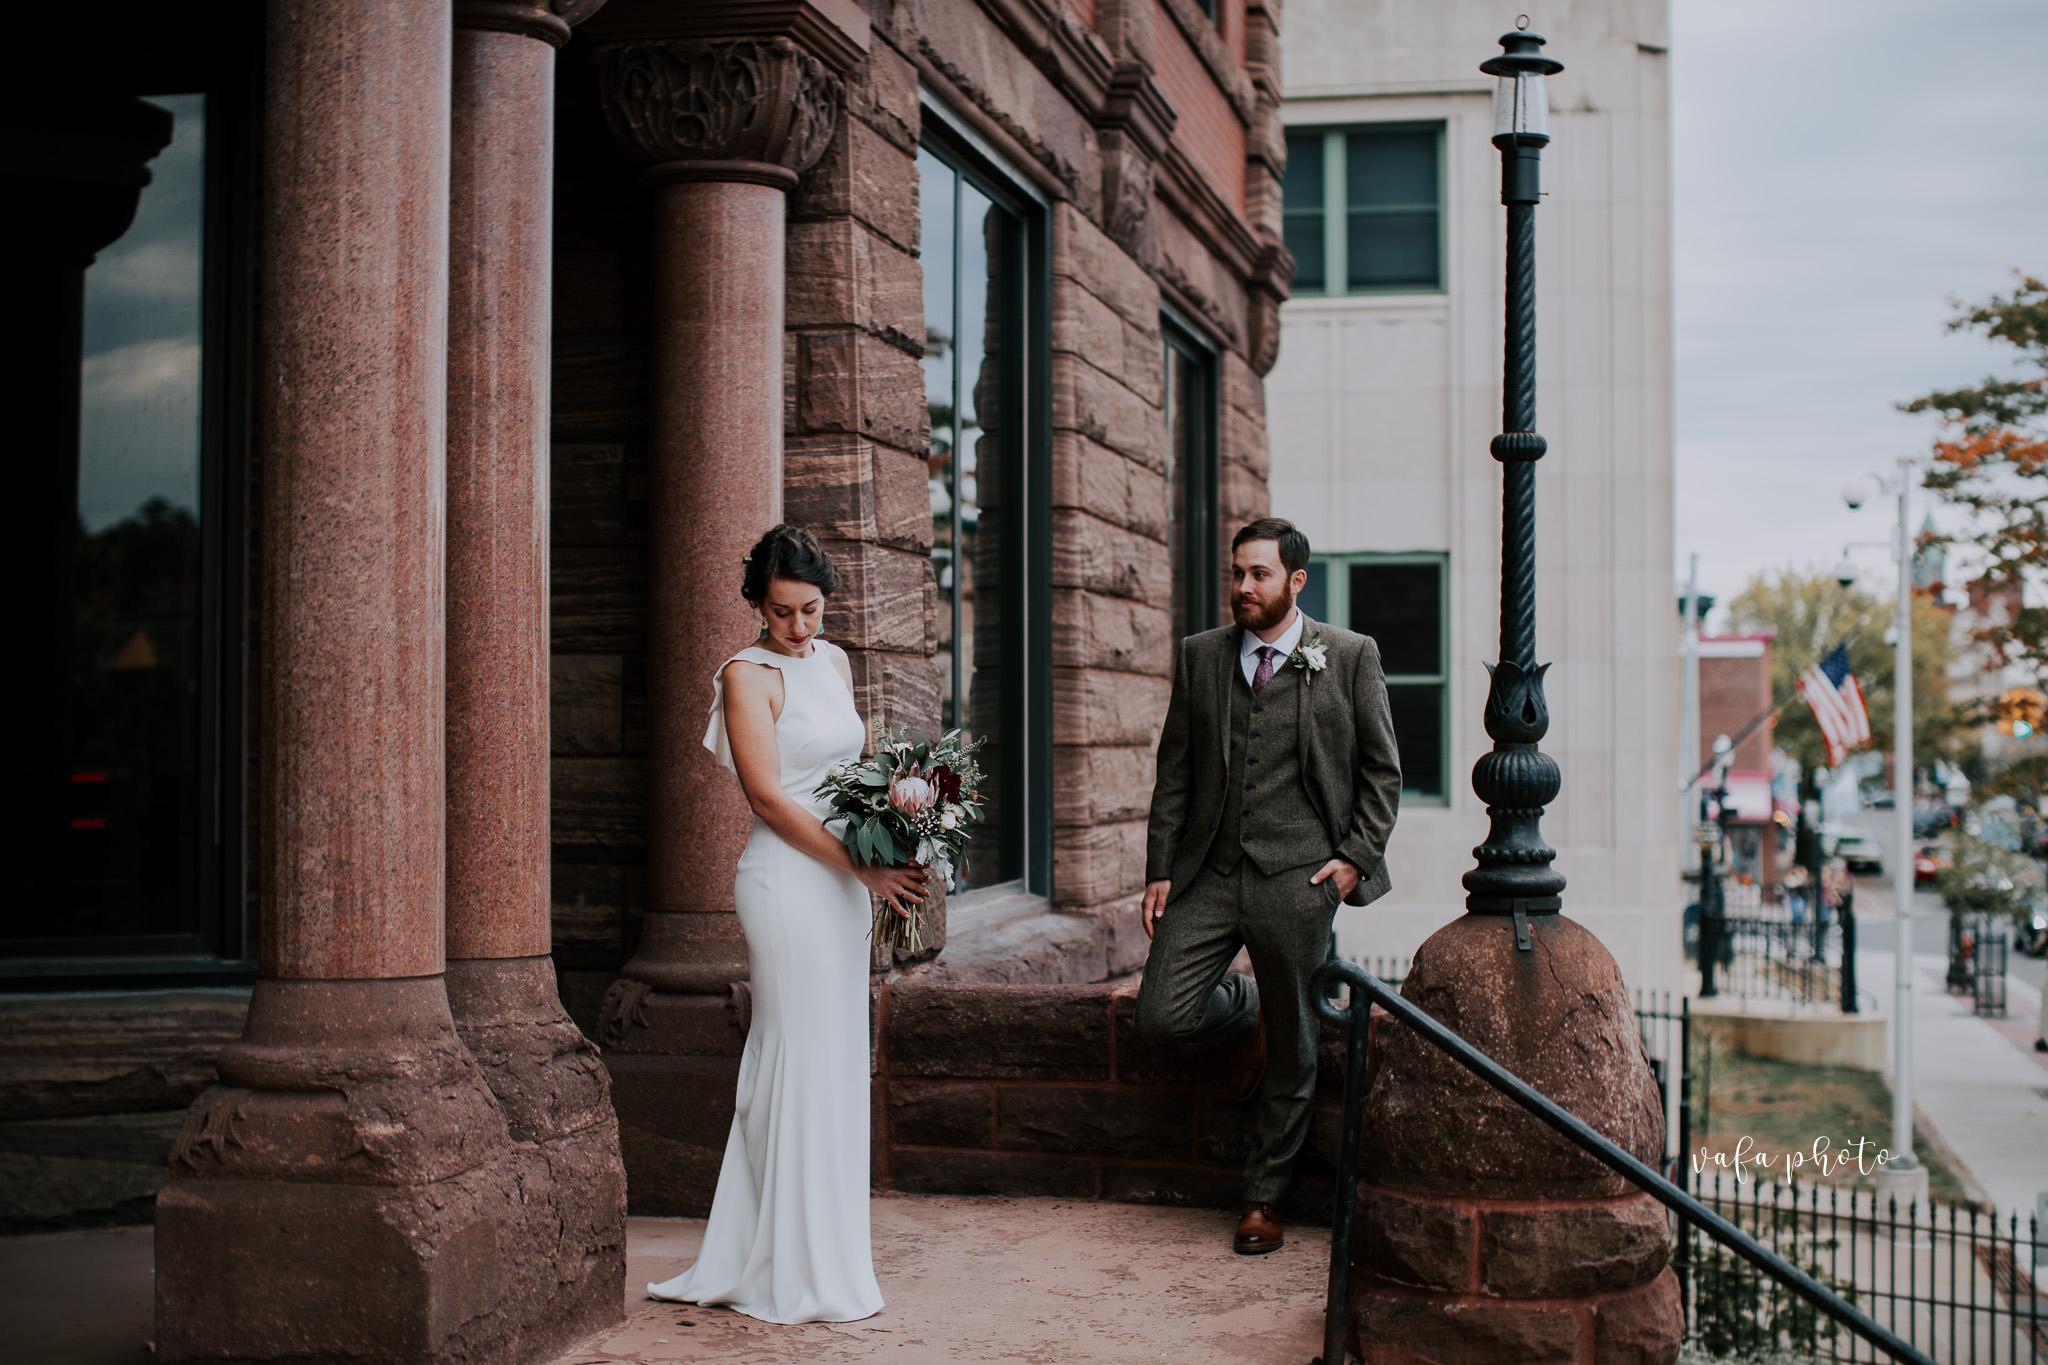 Little-Presque-Isle-Michigan-Wedding-Kim-Kyle-Vafa-Photo-565.jpg